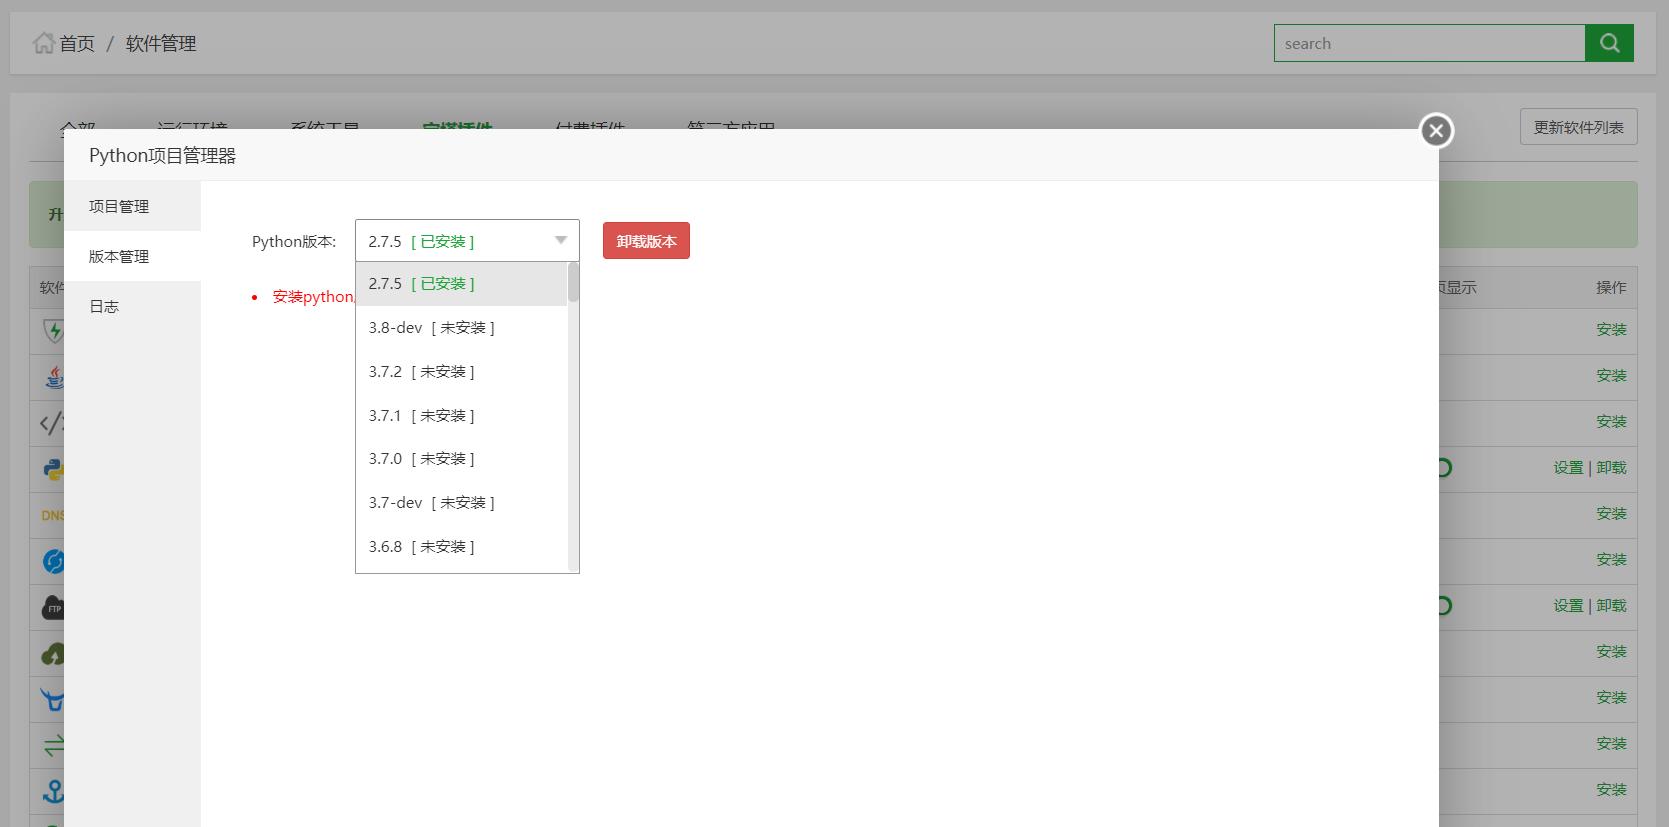 centos 7卸载Python3,并使用宝塔面板插件管理/安装Python所有版本